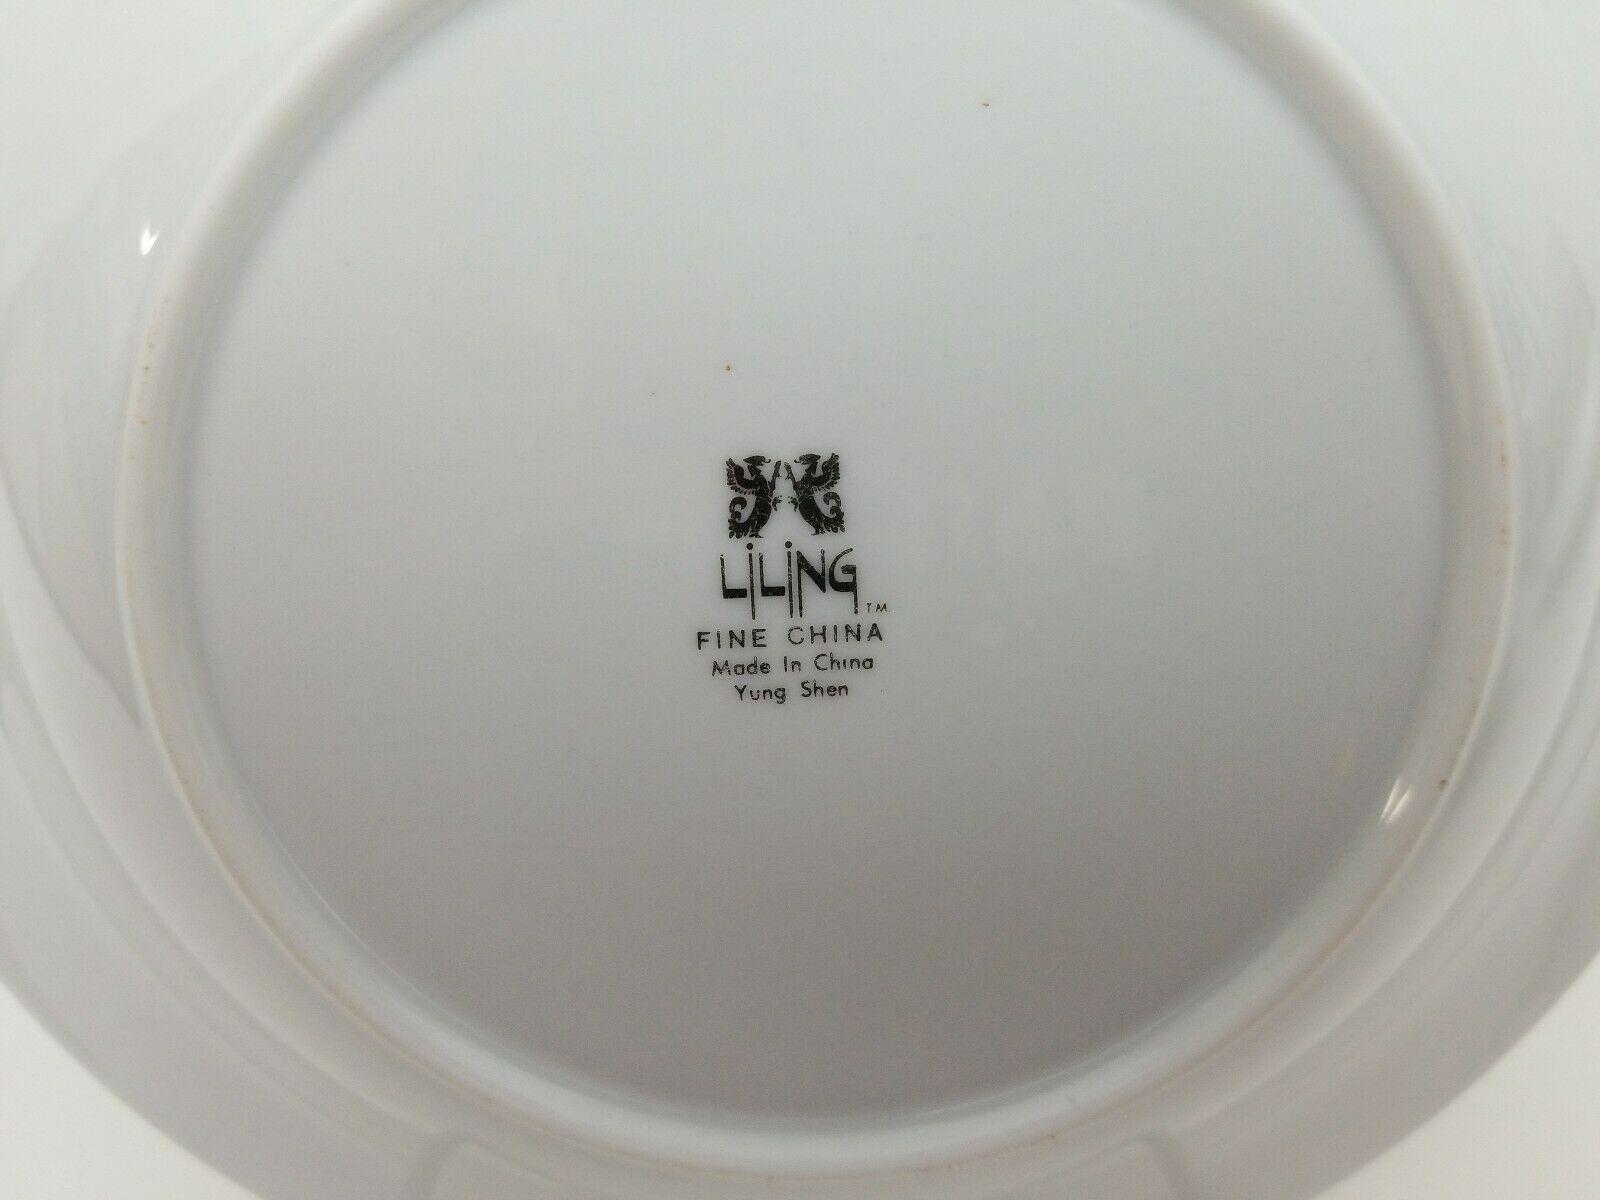 Liling Fine China Cereal Soup Bowls Set of 4 Yung Shen White Roses Keepsake 8.25 image 4